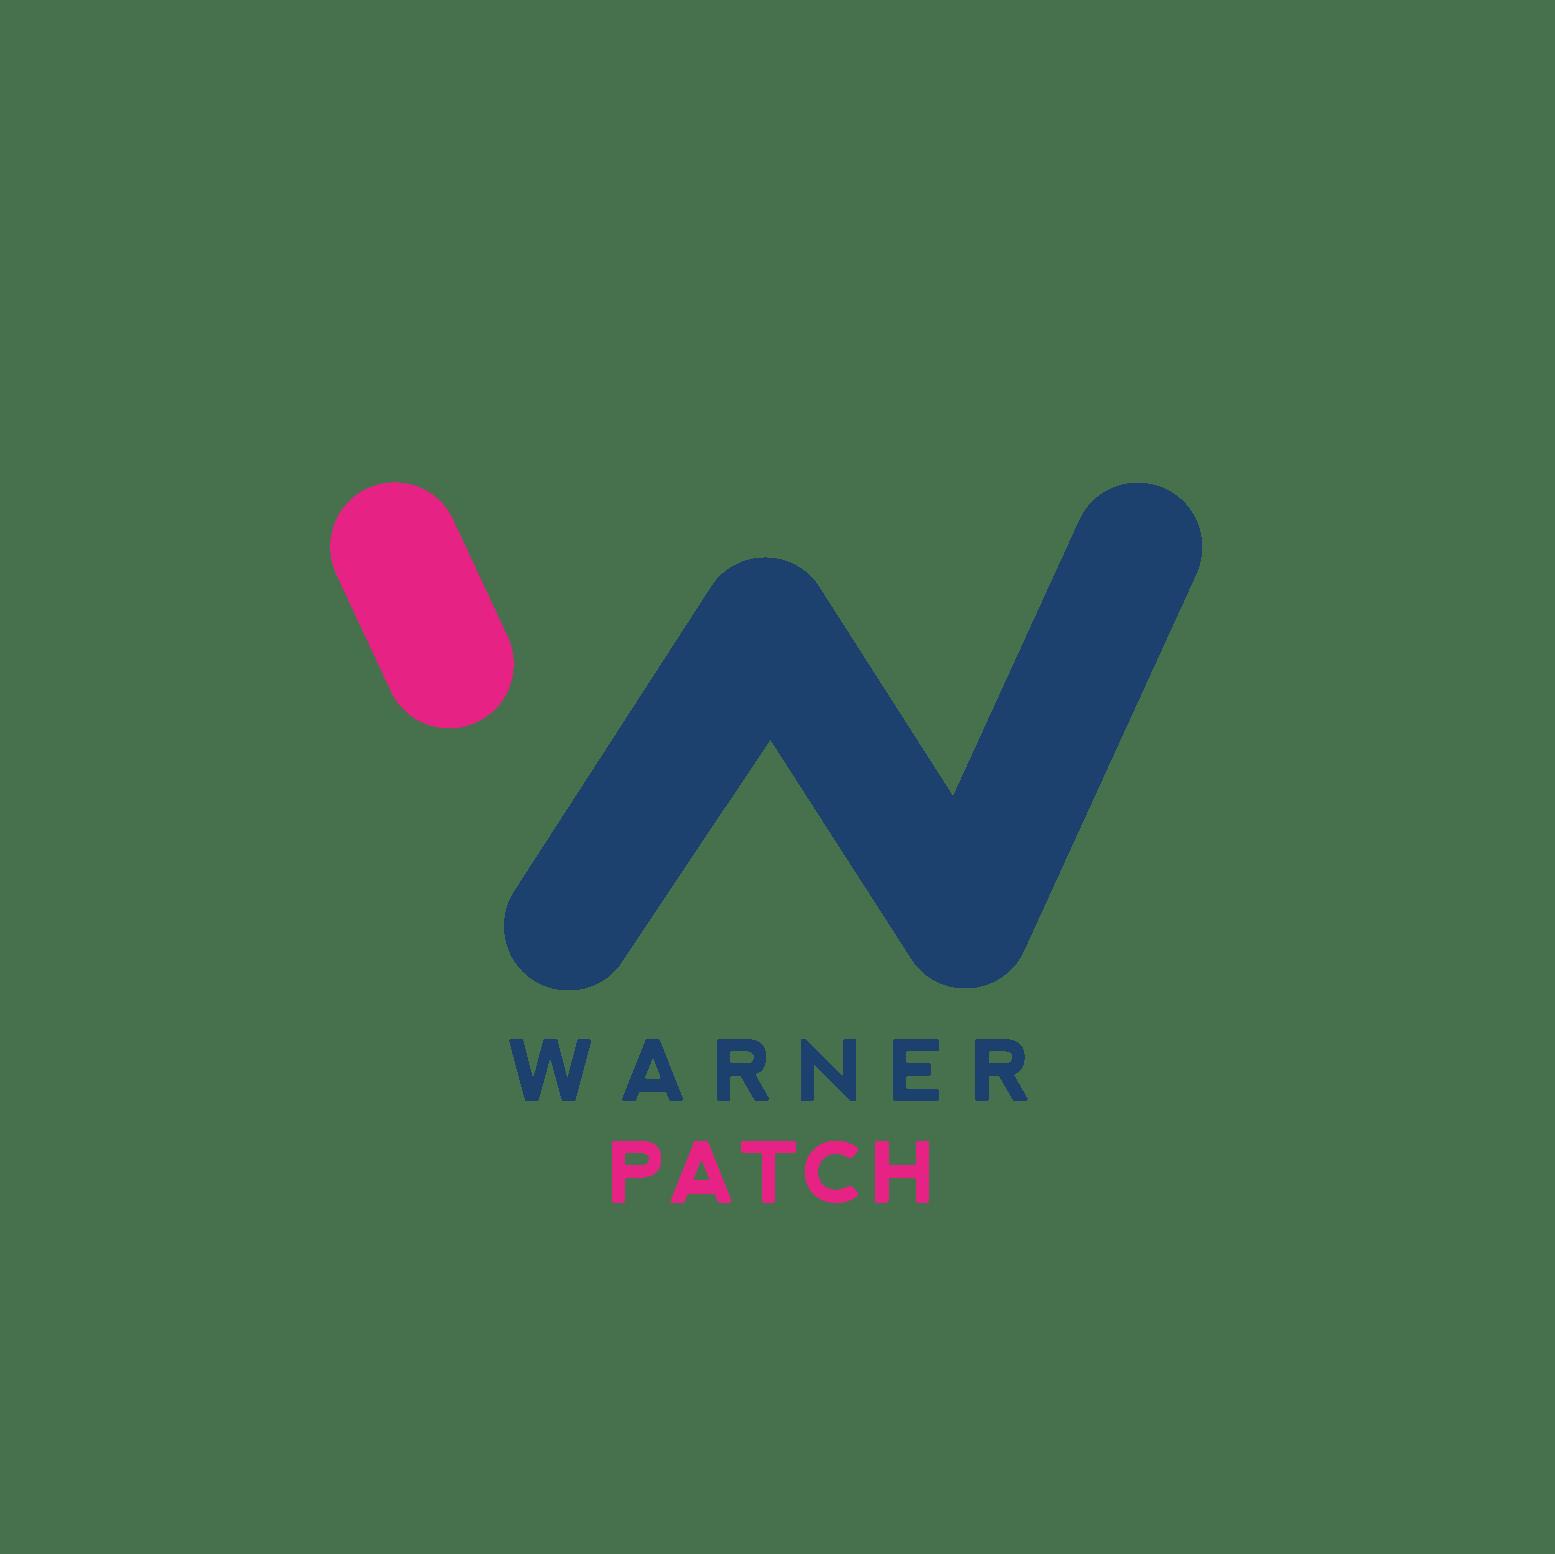 RGB_WarnerPatch_MASTER LOGO_WhiteBG